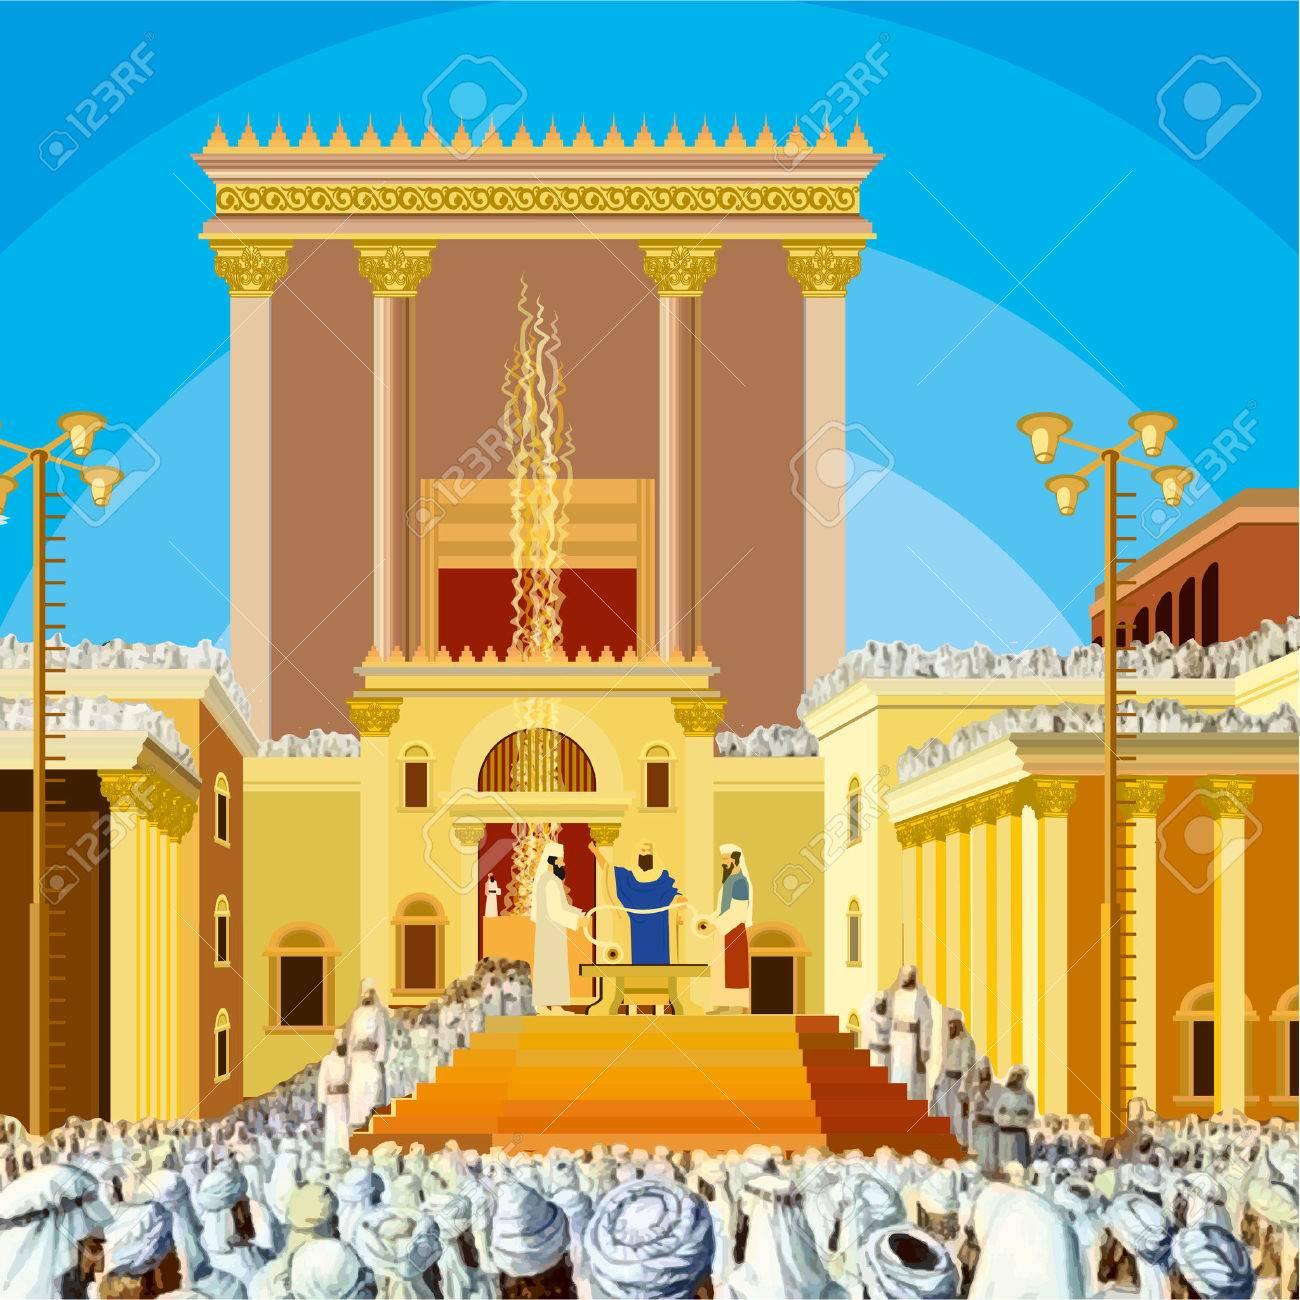 Jerusalem Temple. A scene of a Jewish King long ago in the era...